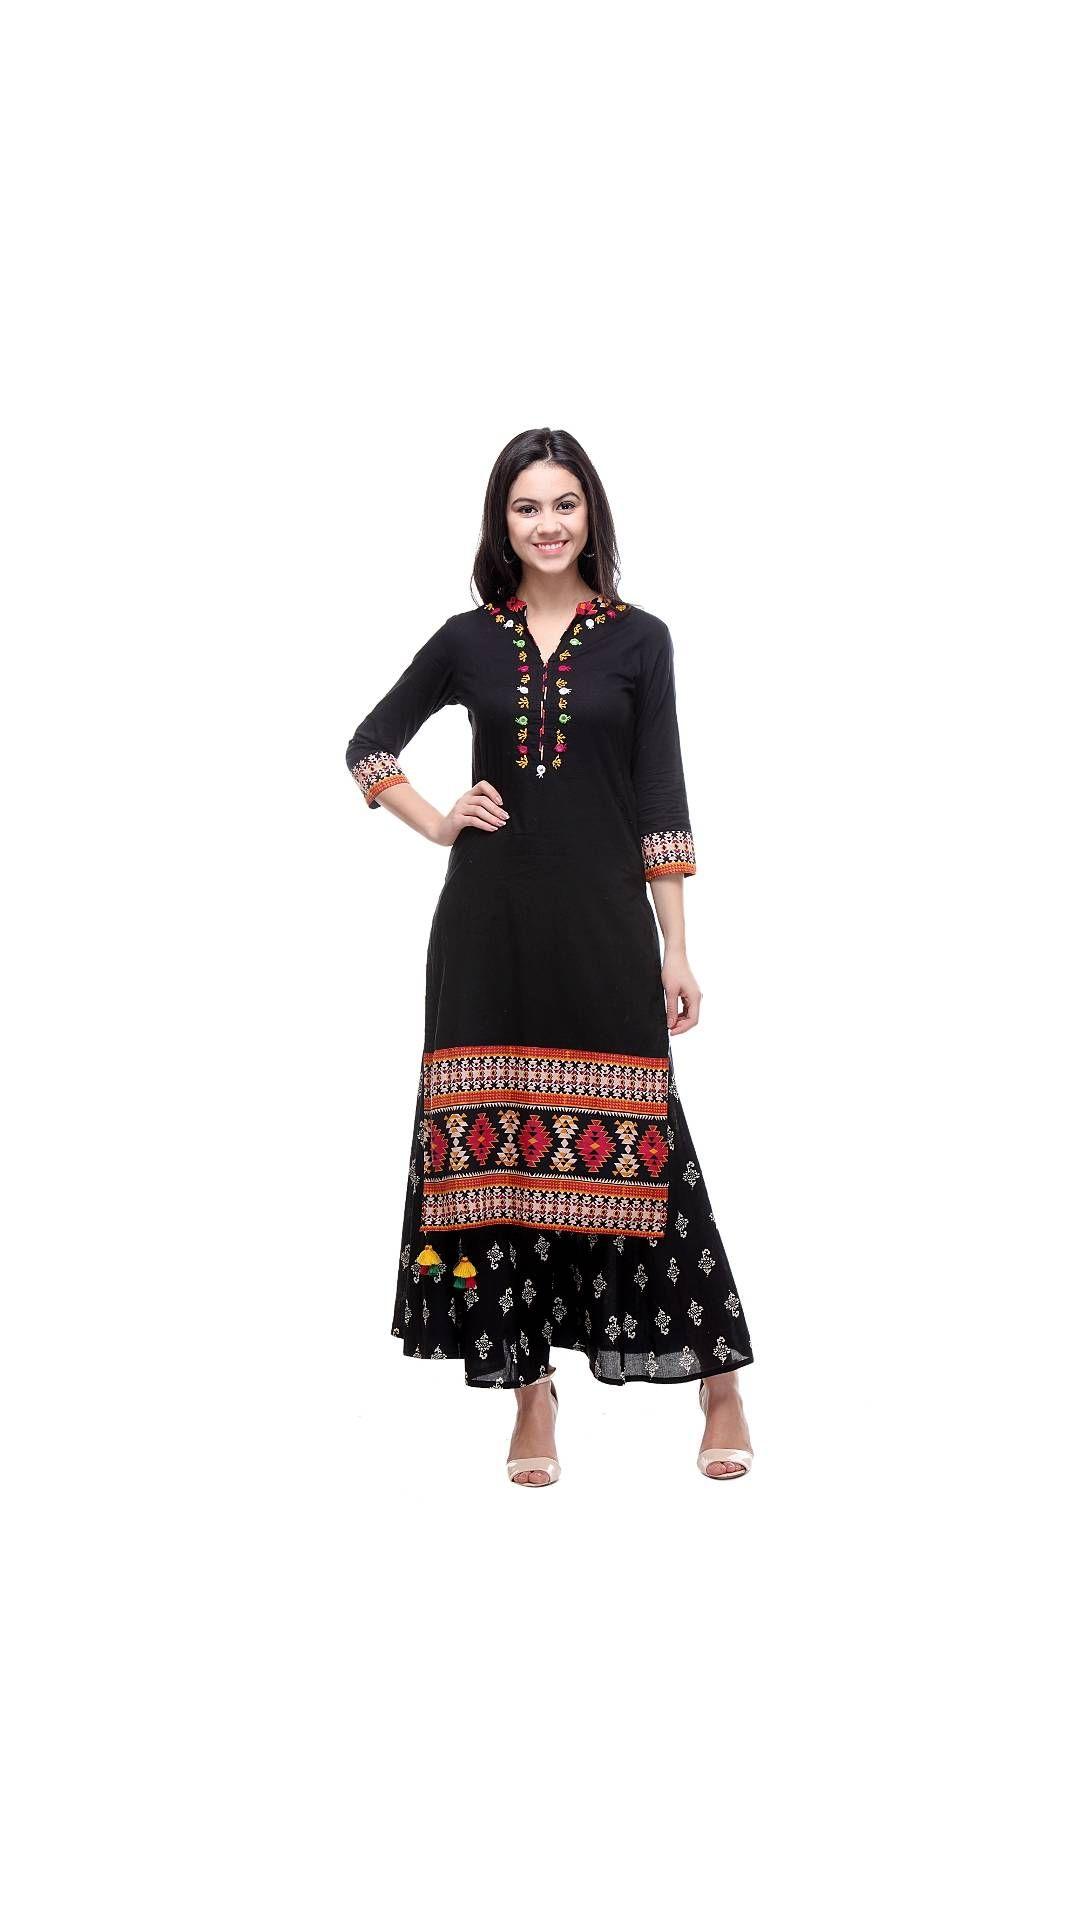 6fe4094507e1 Varanga Black Embroidered Cotton Chinese/Mandarin Collar 3/4 Sleeve ...